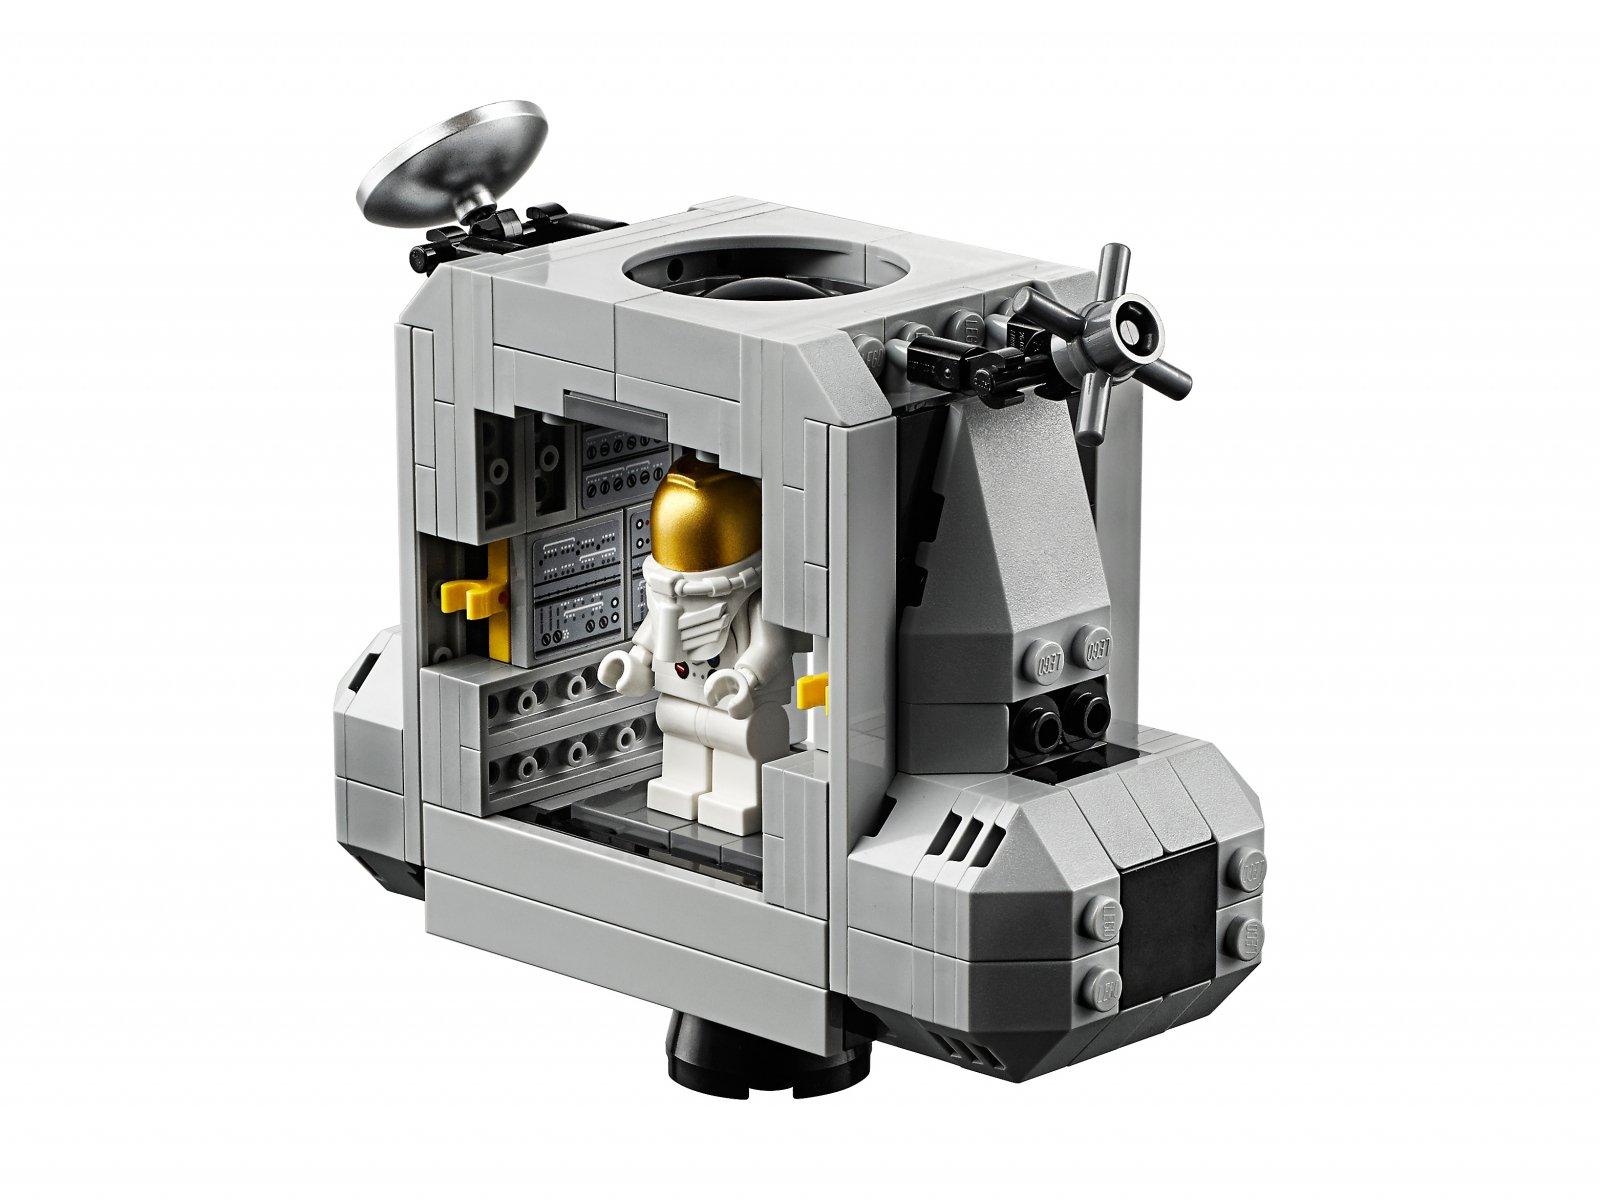 LEGO 10266 Creator Expert Lądownik księżycowy Apollo 11 NASA